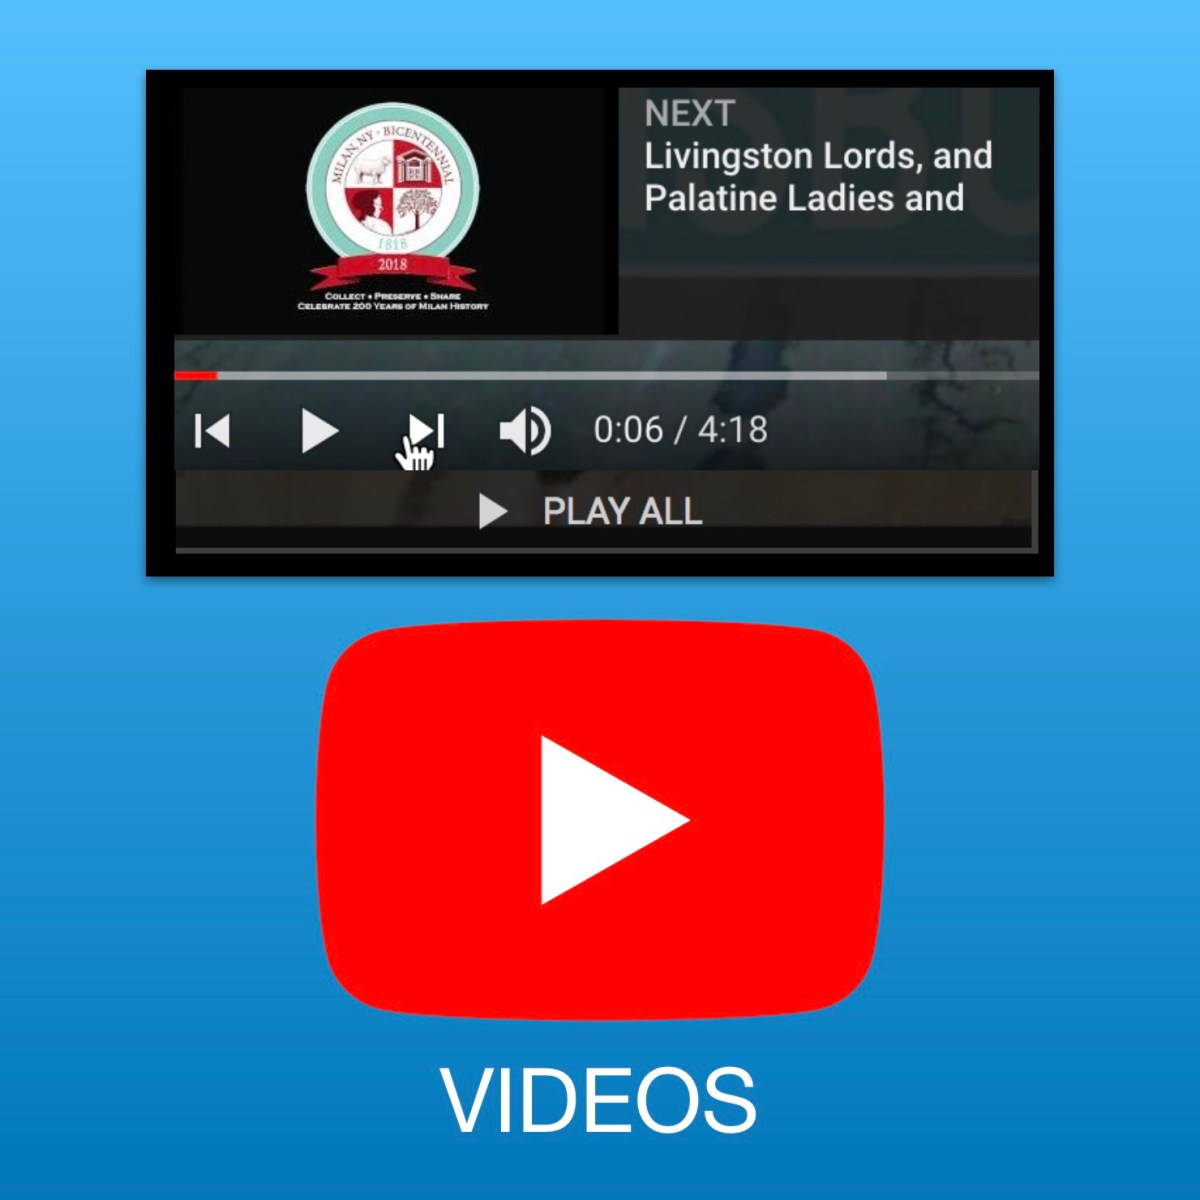 HistorySpeaks Video Library